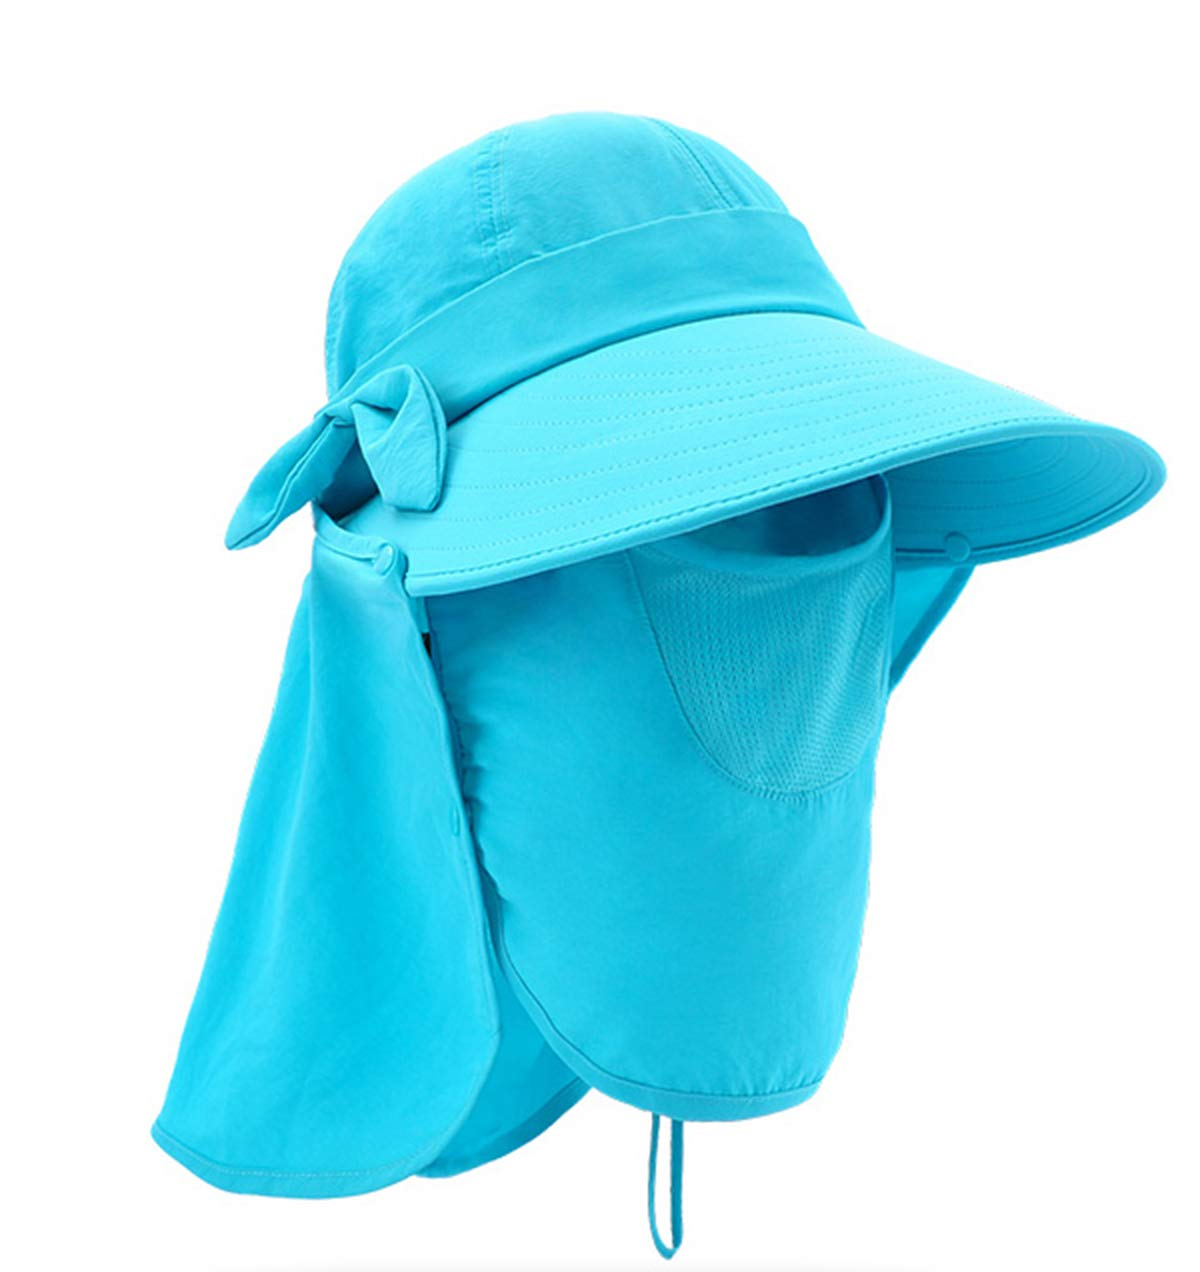 9077f7e0cc2b5e Amazon.com : Epsion Women Summer Neck Flap Sun Visor/Hats Wide Brim UV  Protection UPF 50+ Hiking Cap Adjustable : Sports & Outdoors